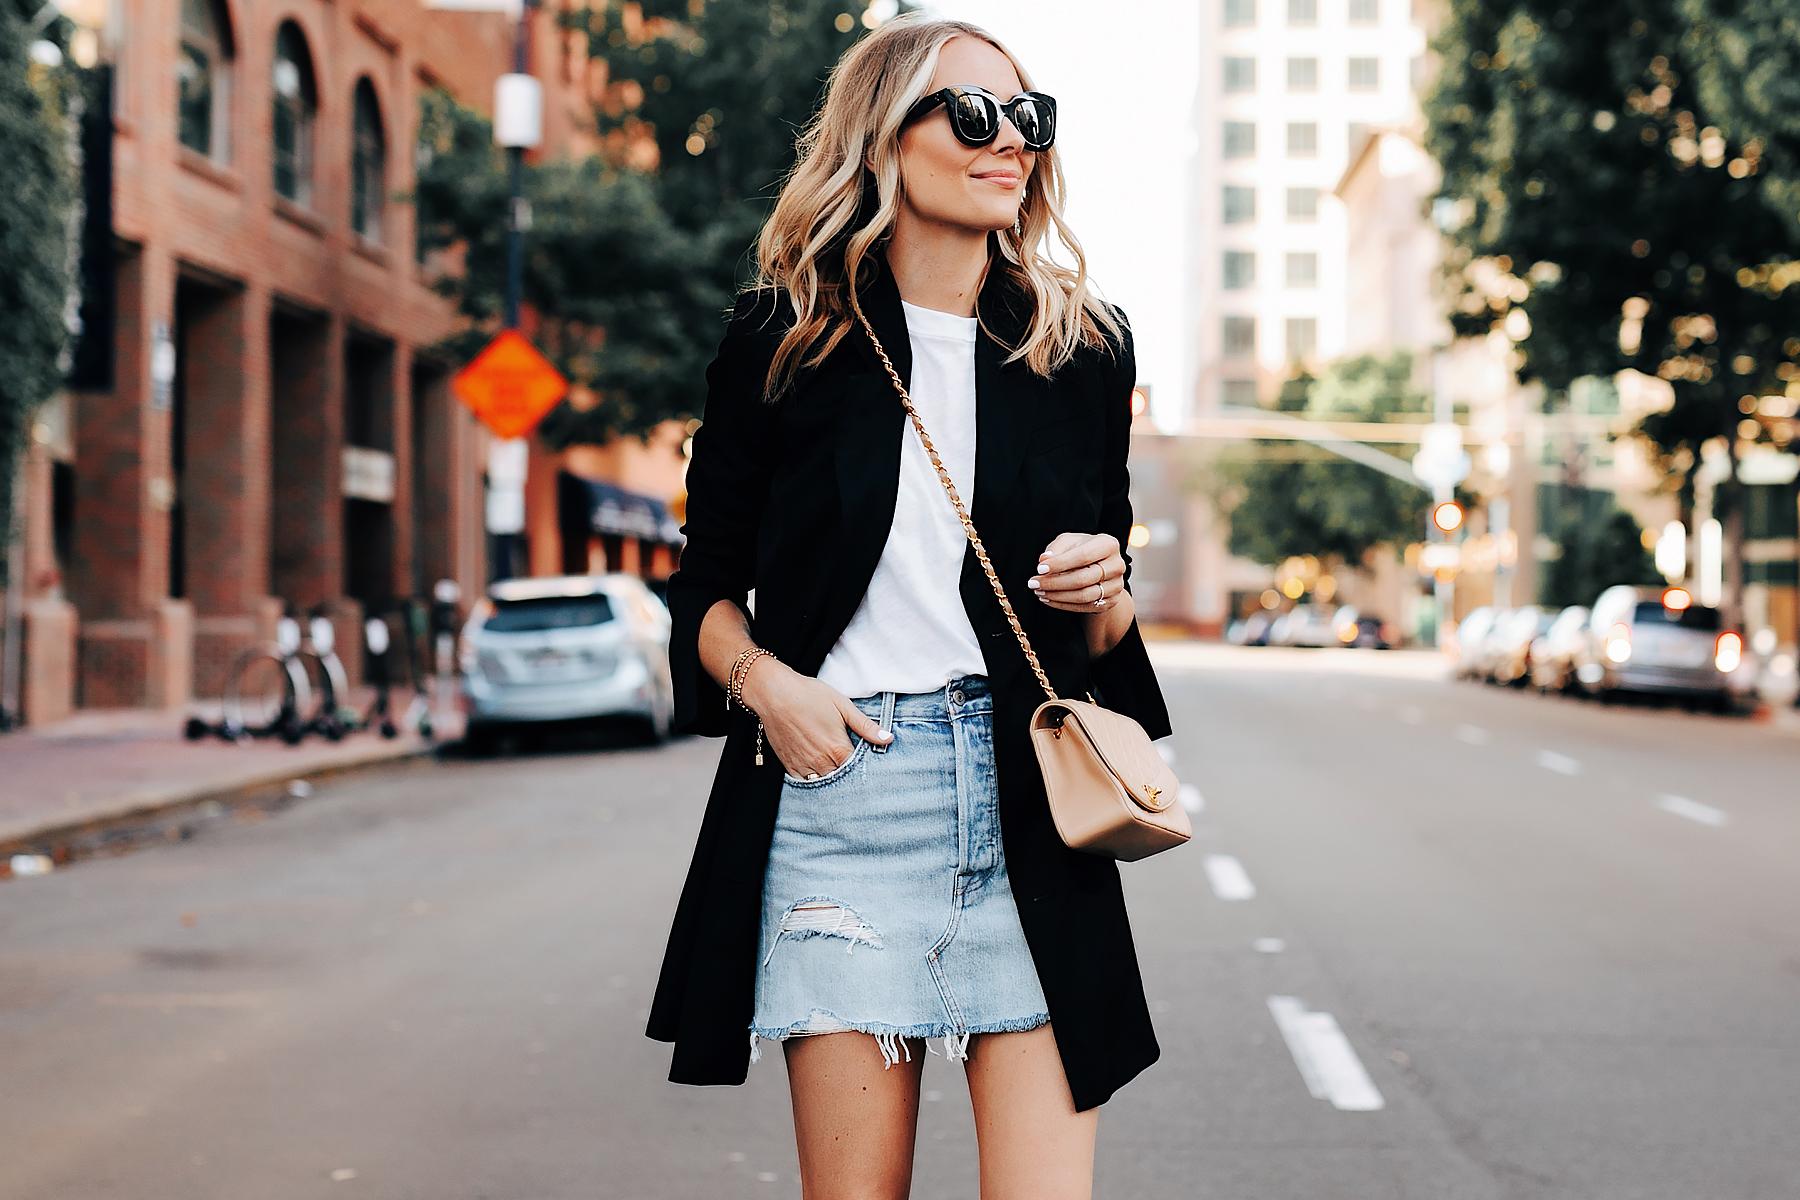 Fashion Jackson Wearing Anine Bing Black Blazer White Tshirt Levis Denim Skirt Chanel Beige Handbag Black Celine Sunglasses